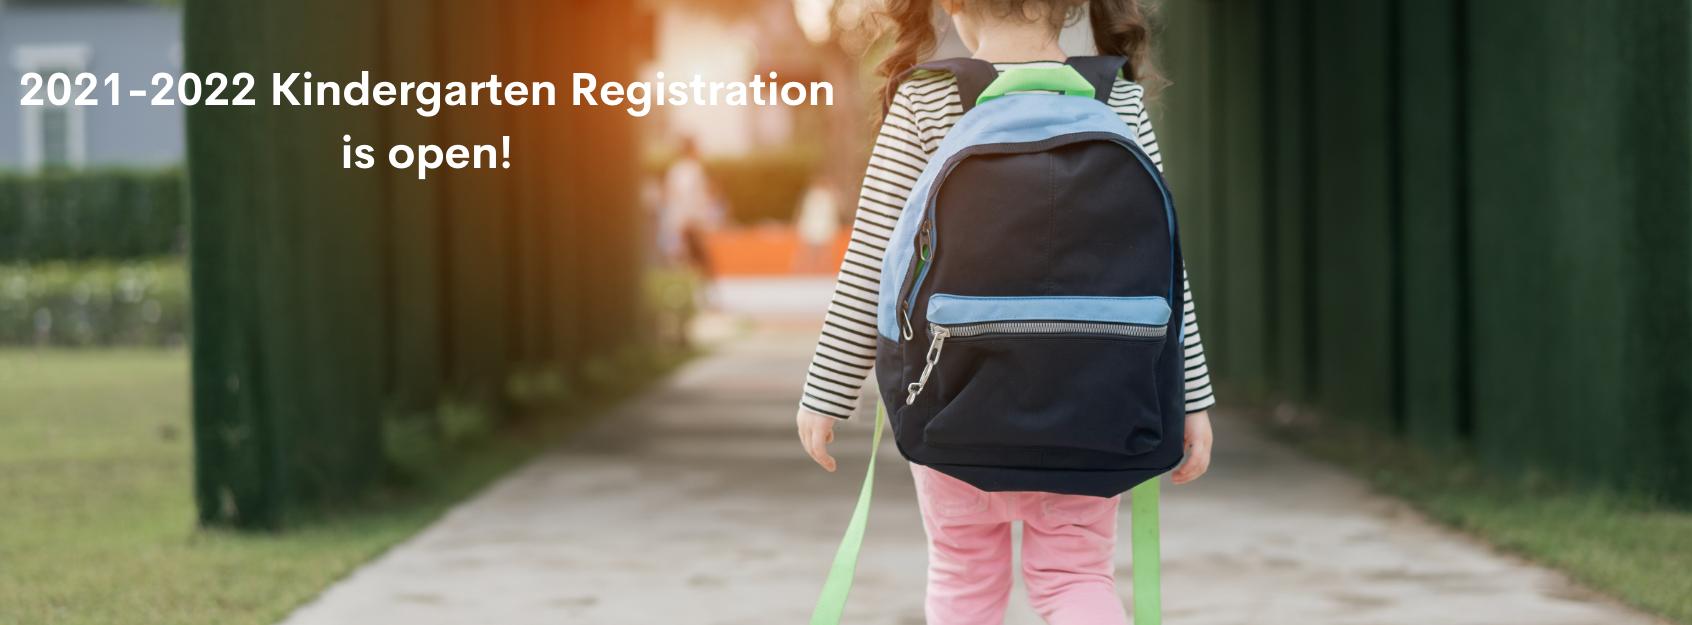 2021-2022 Registration